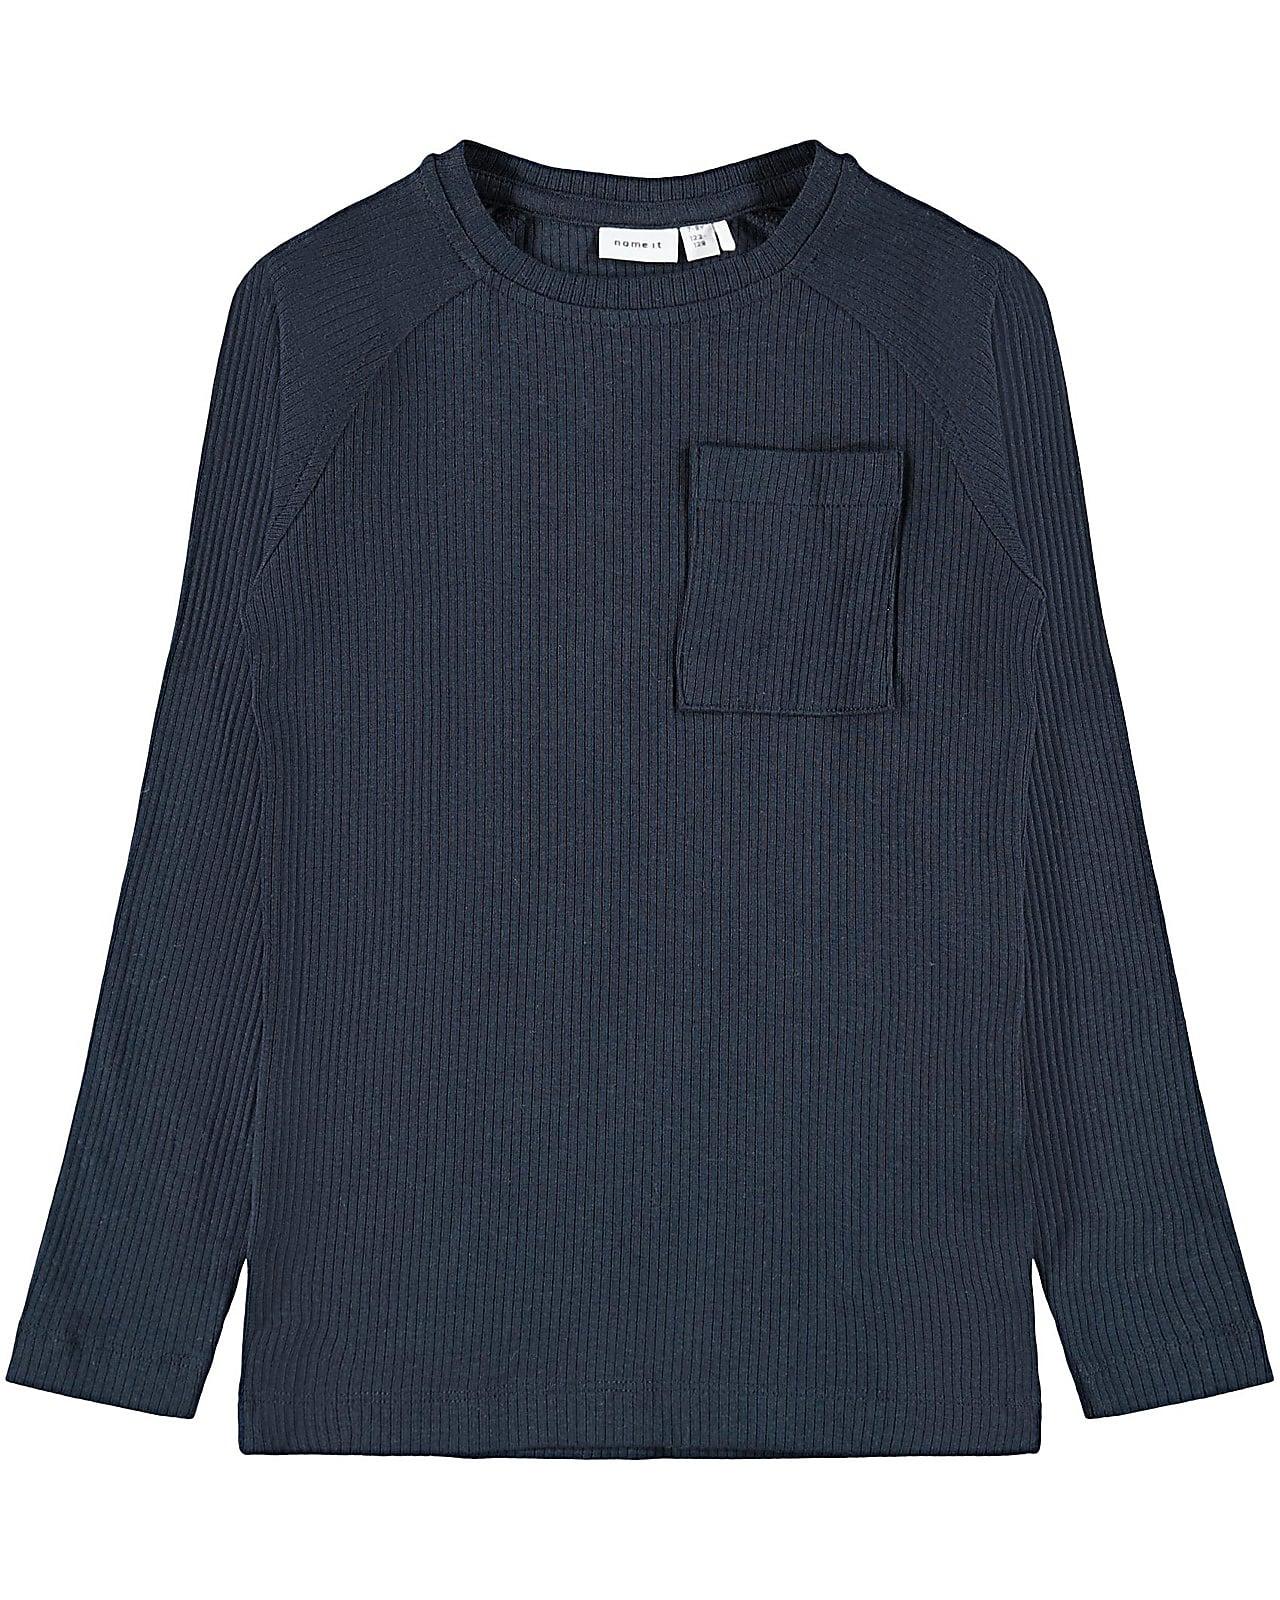 Image of Name It t-shirt l/s, Kabilleon, darksapphire